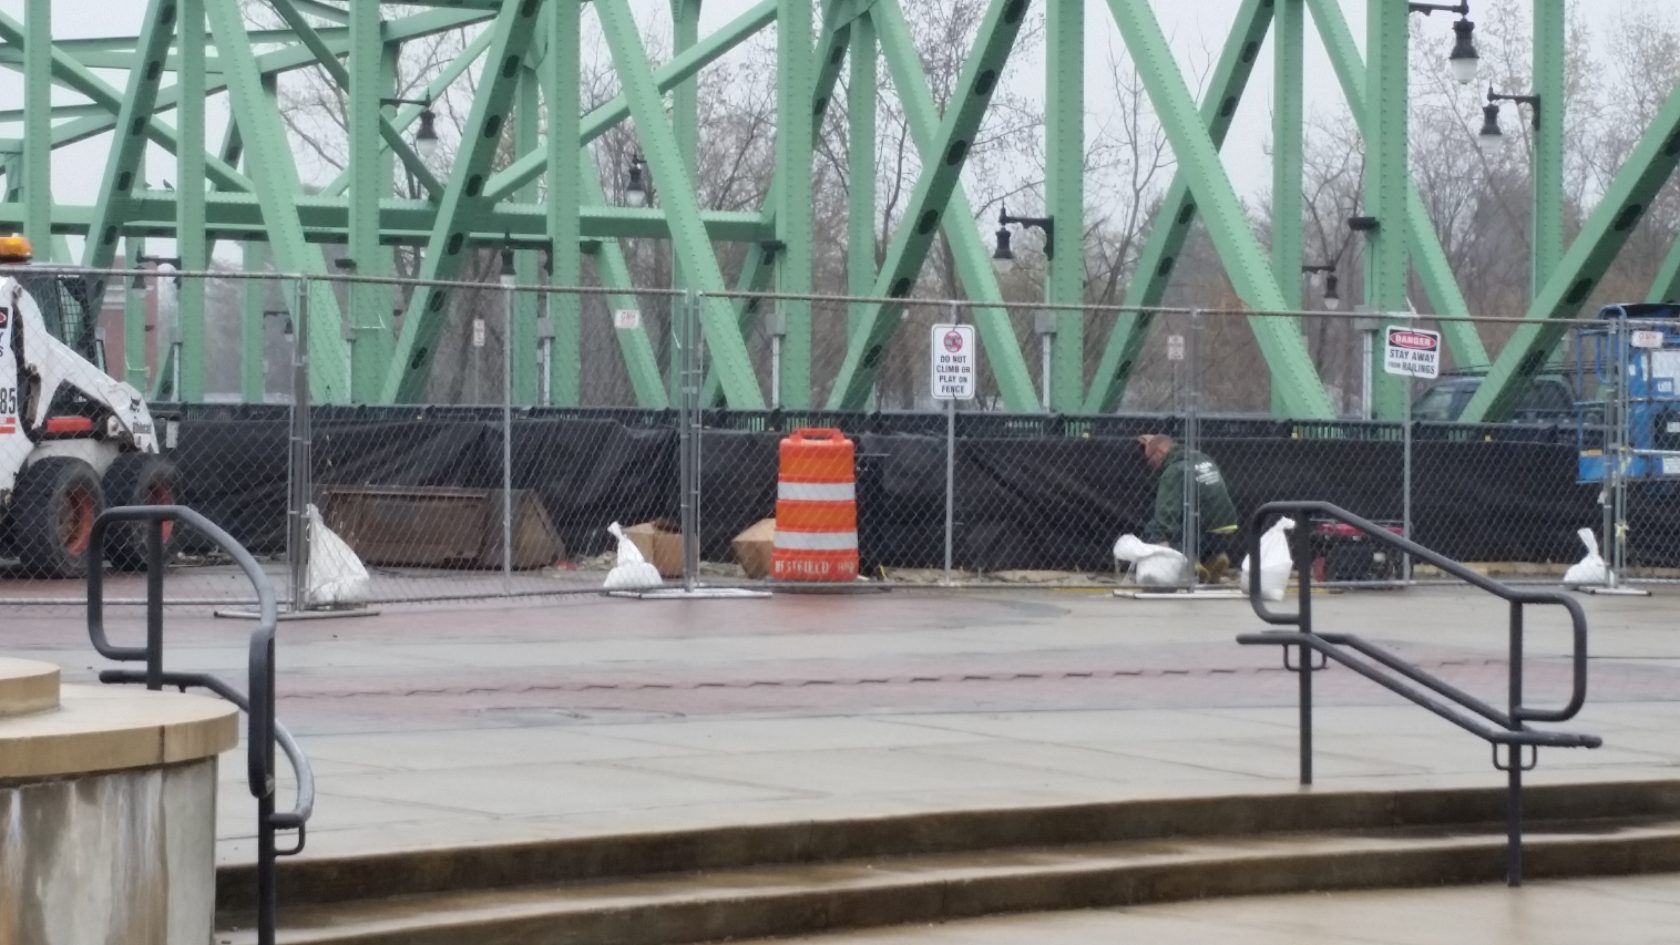 Bridge balustrade project moving along